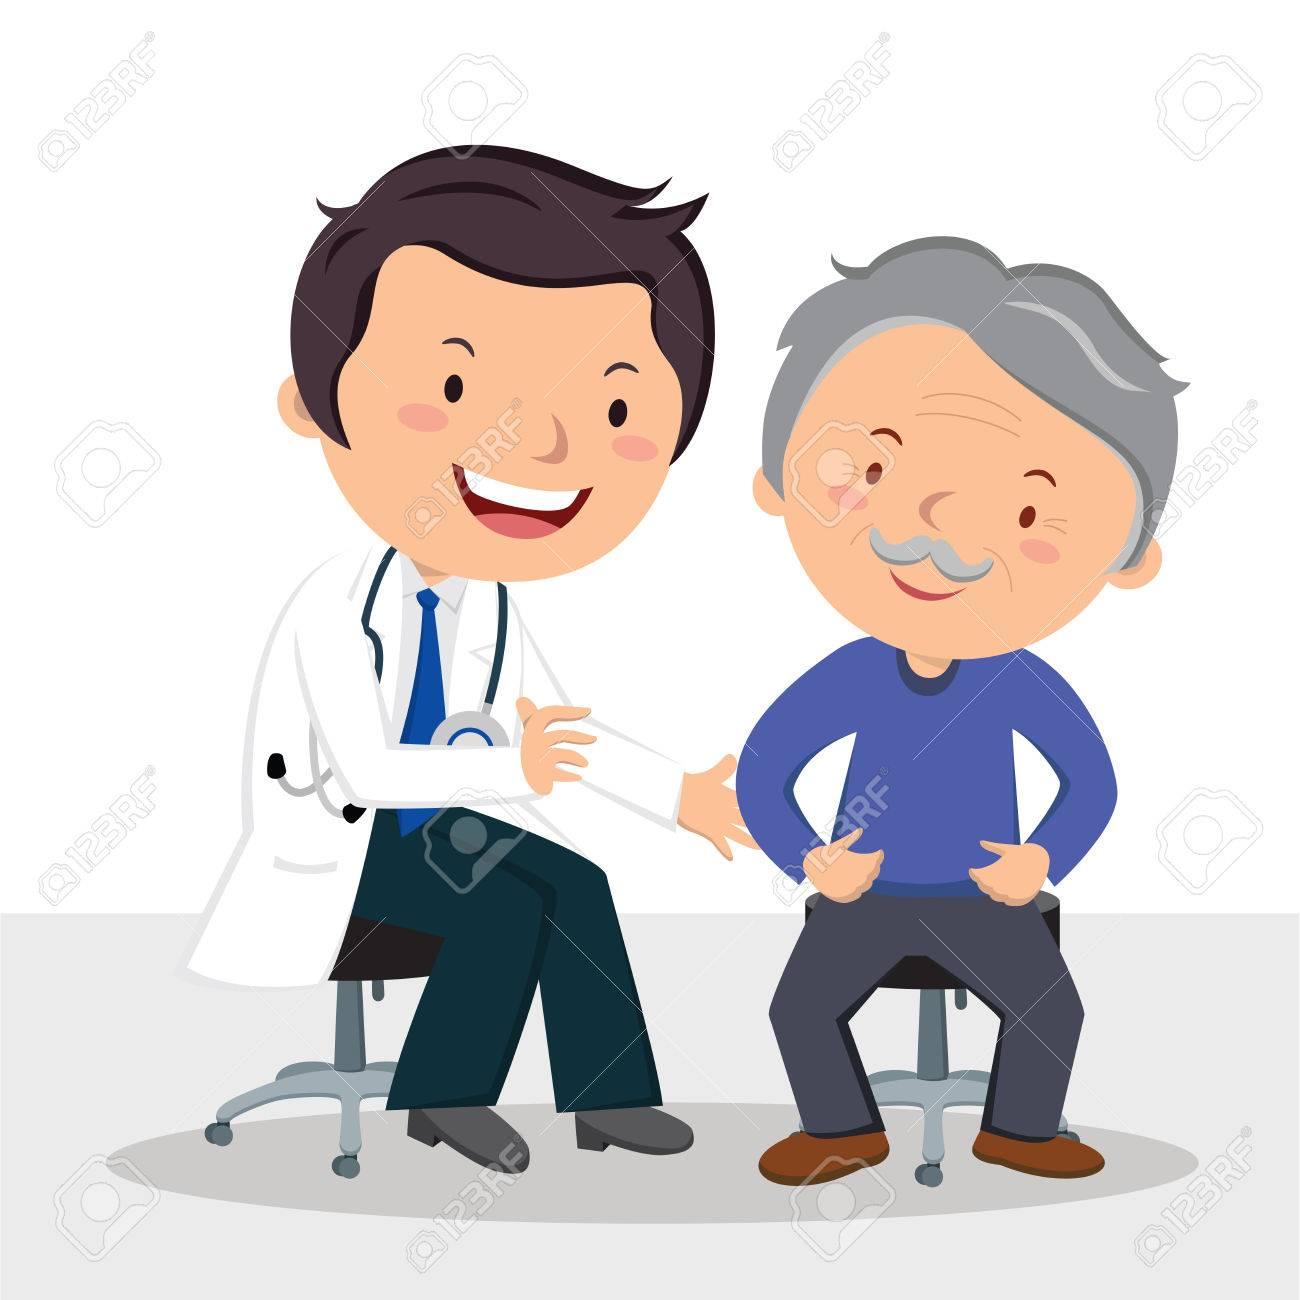 Male doctor examining patient. Vector illustration of a friendly male doctor examining senior man. - 83855282